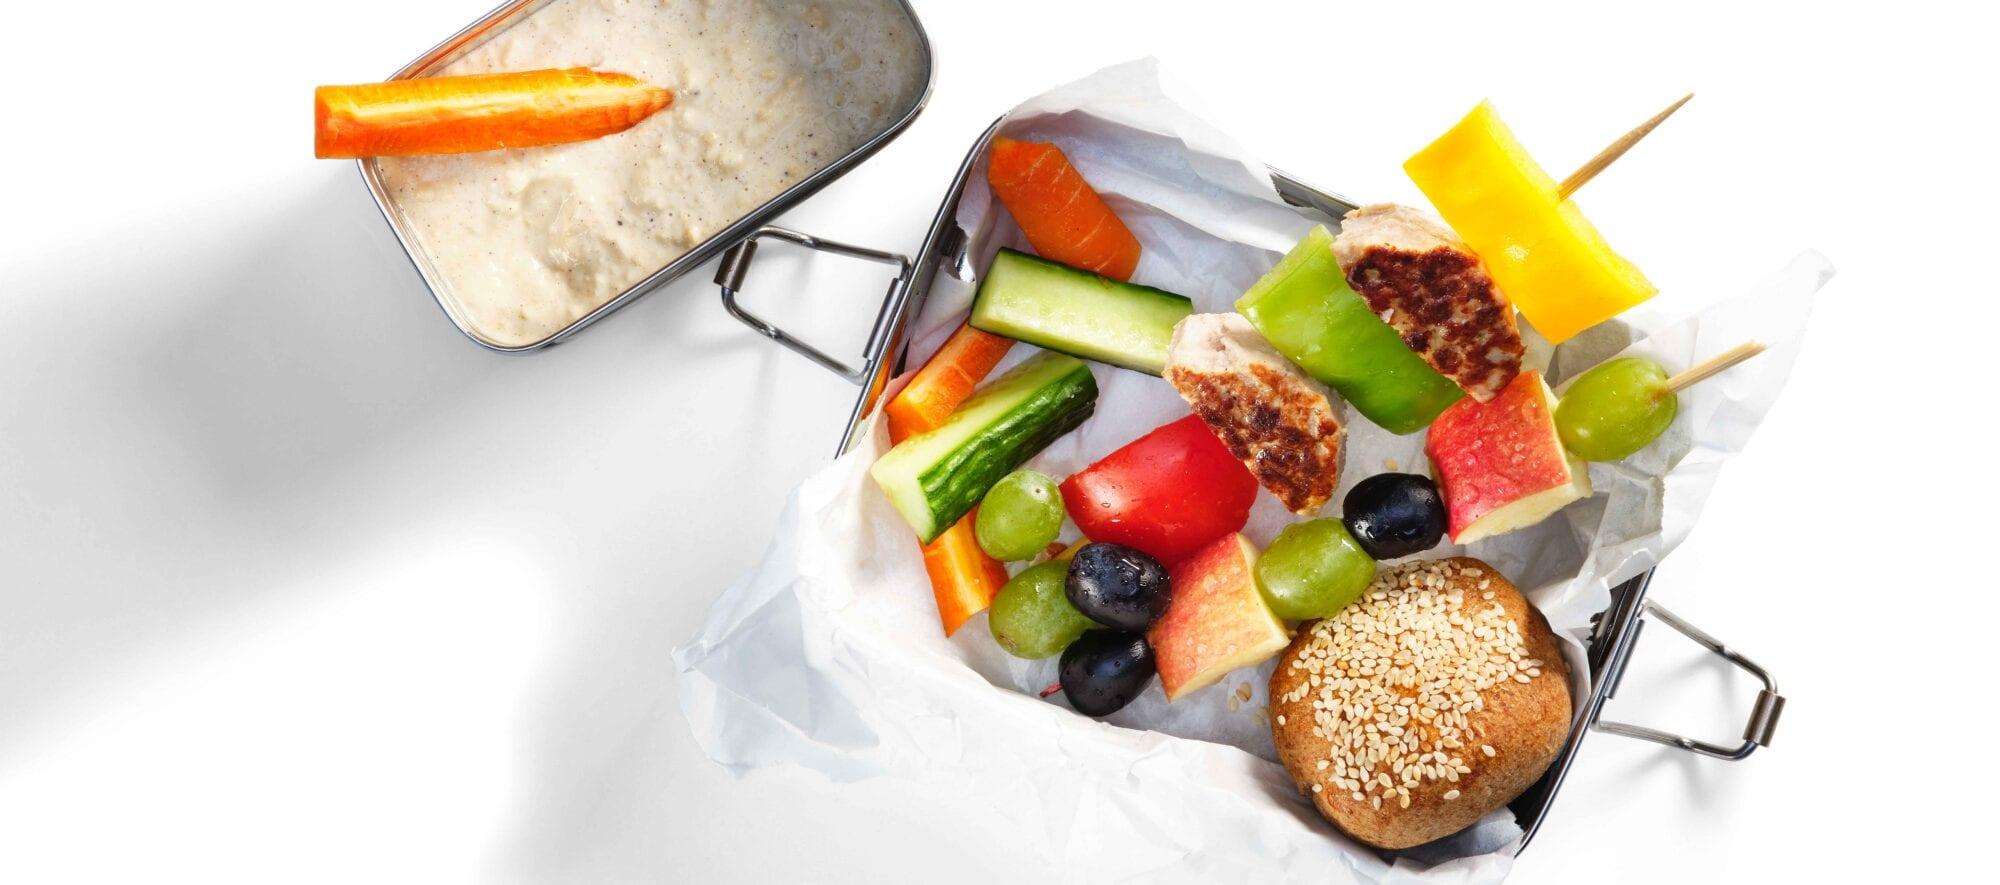 Frikadellespyd med grøntsager til hummus og fuldkornsbrød